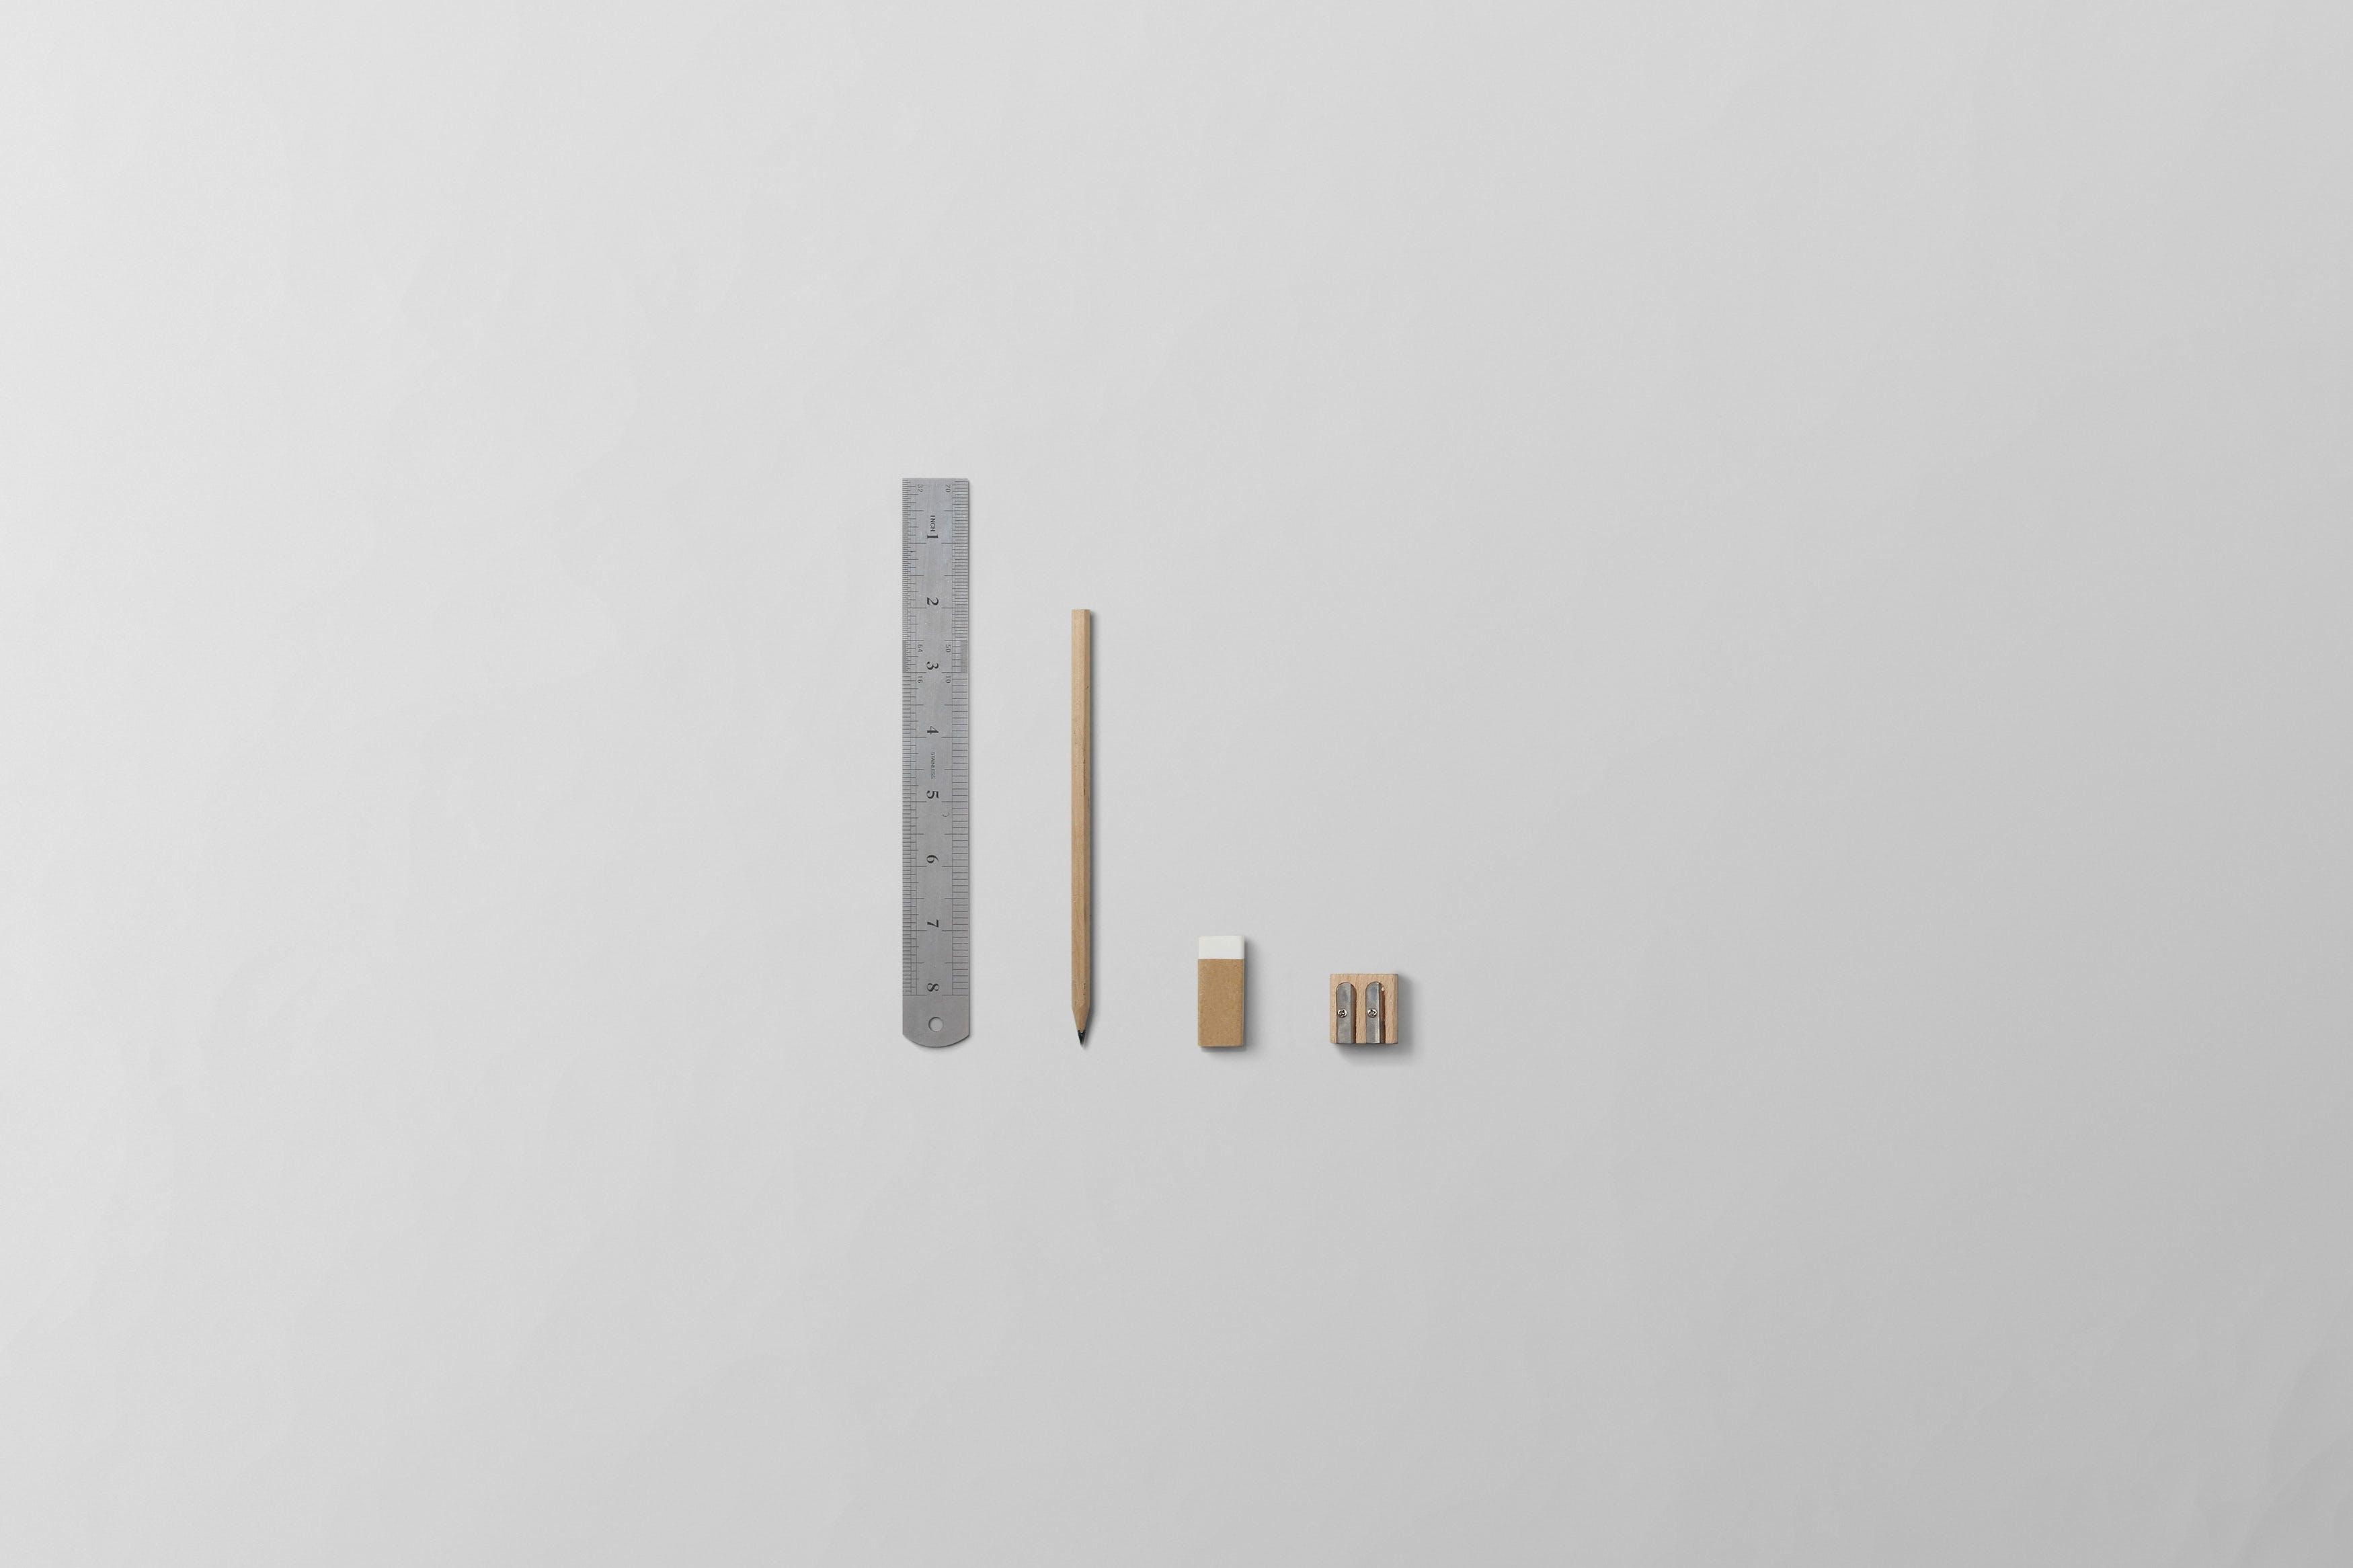 Free stock photo of ruler, architect, pencil, eraser